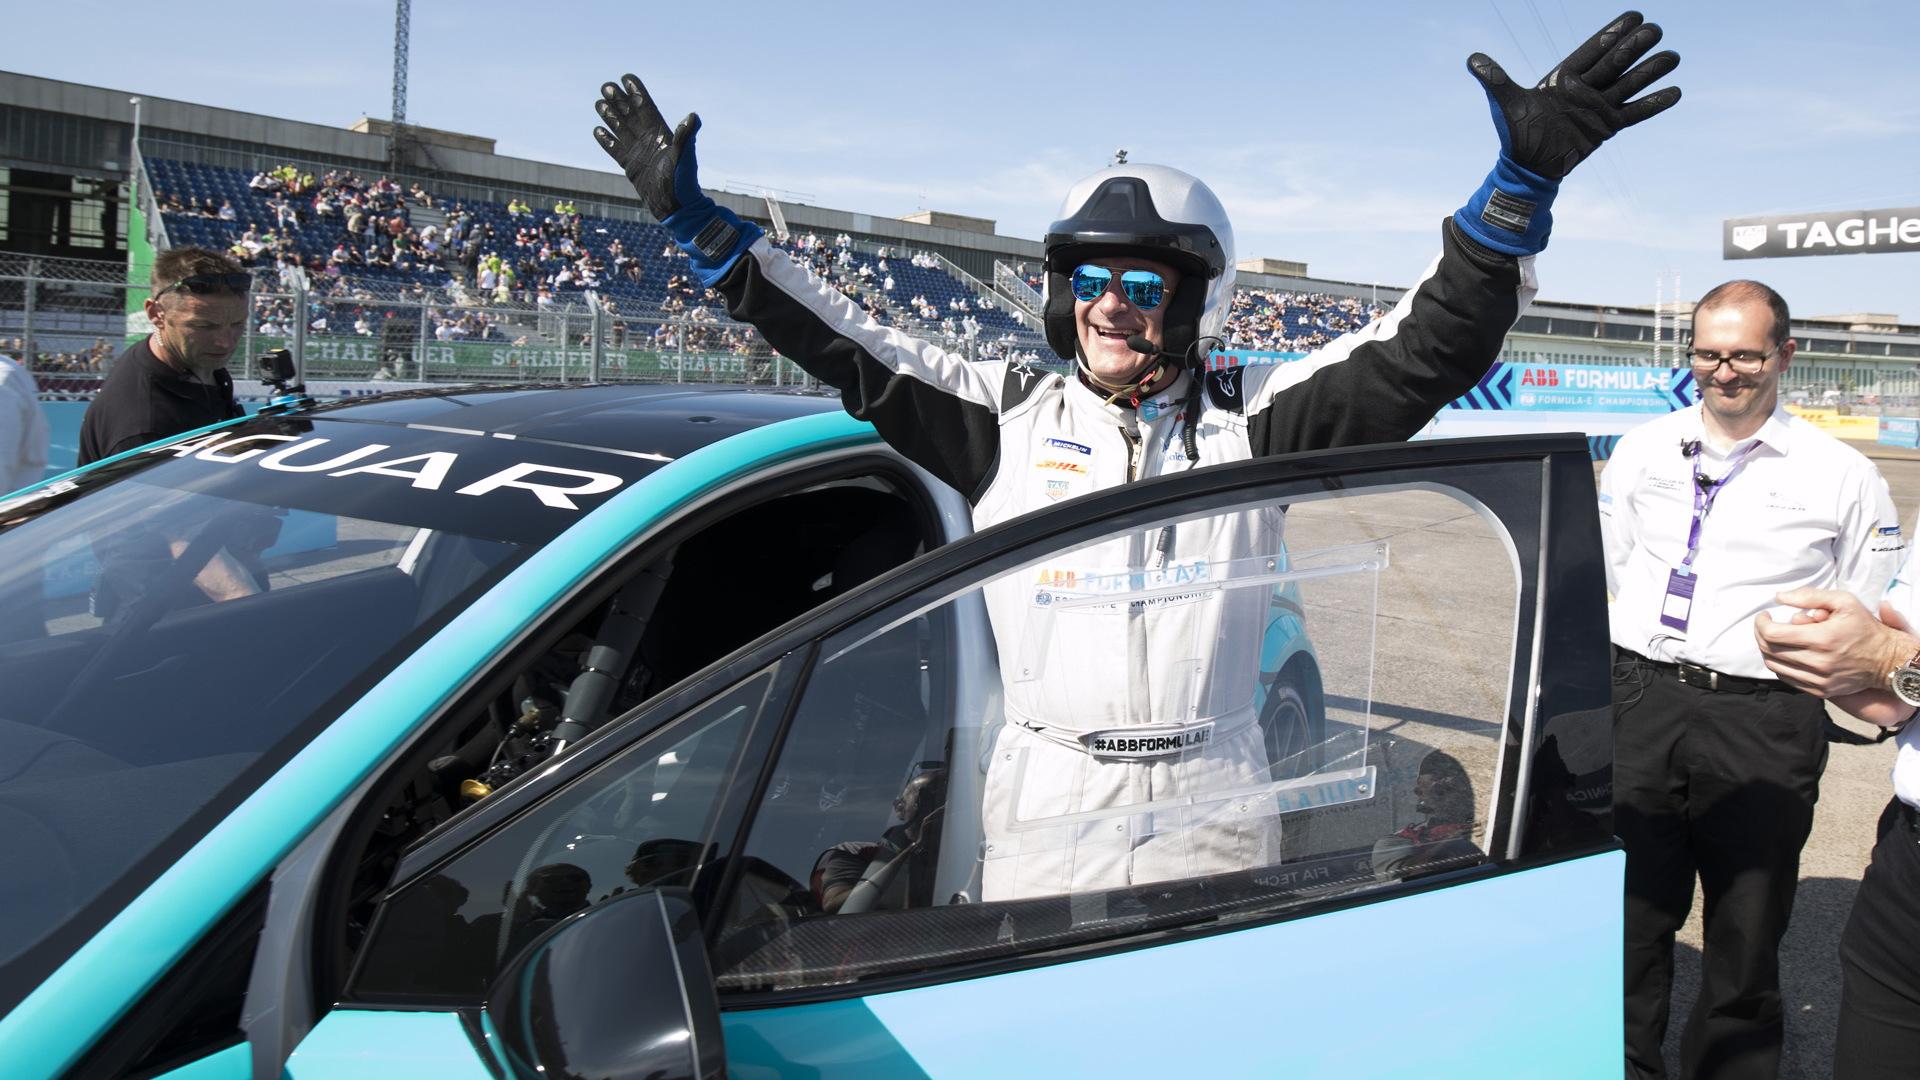 Jaguar I-Pace eTrophy race car dynamic debut during 2018 Formula E Berlin ePrix